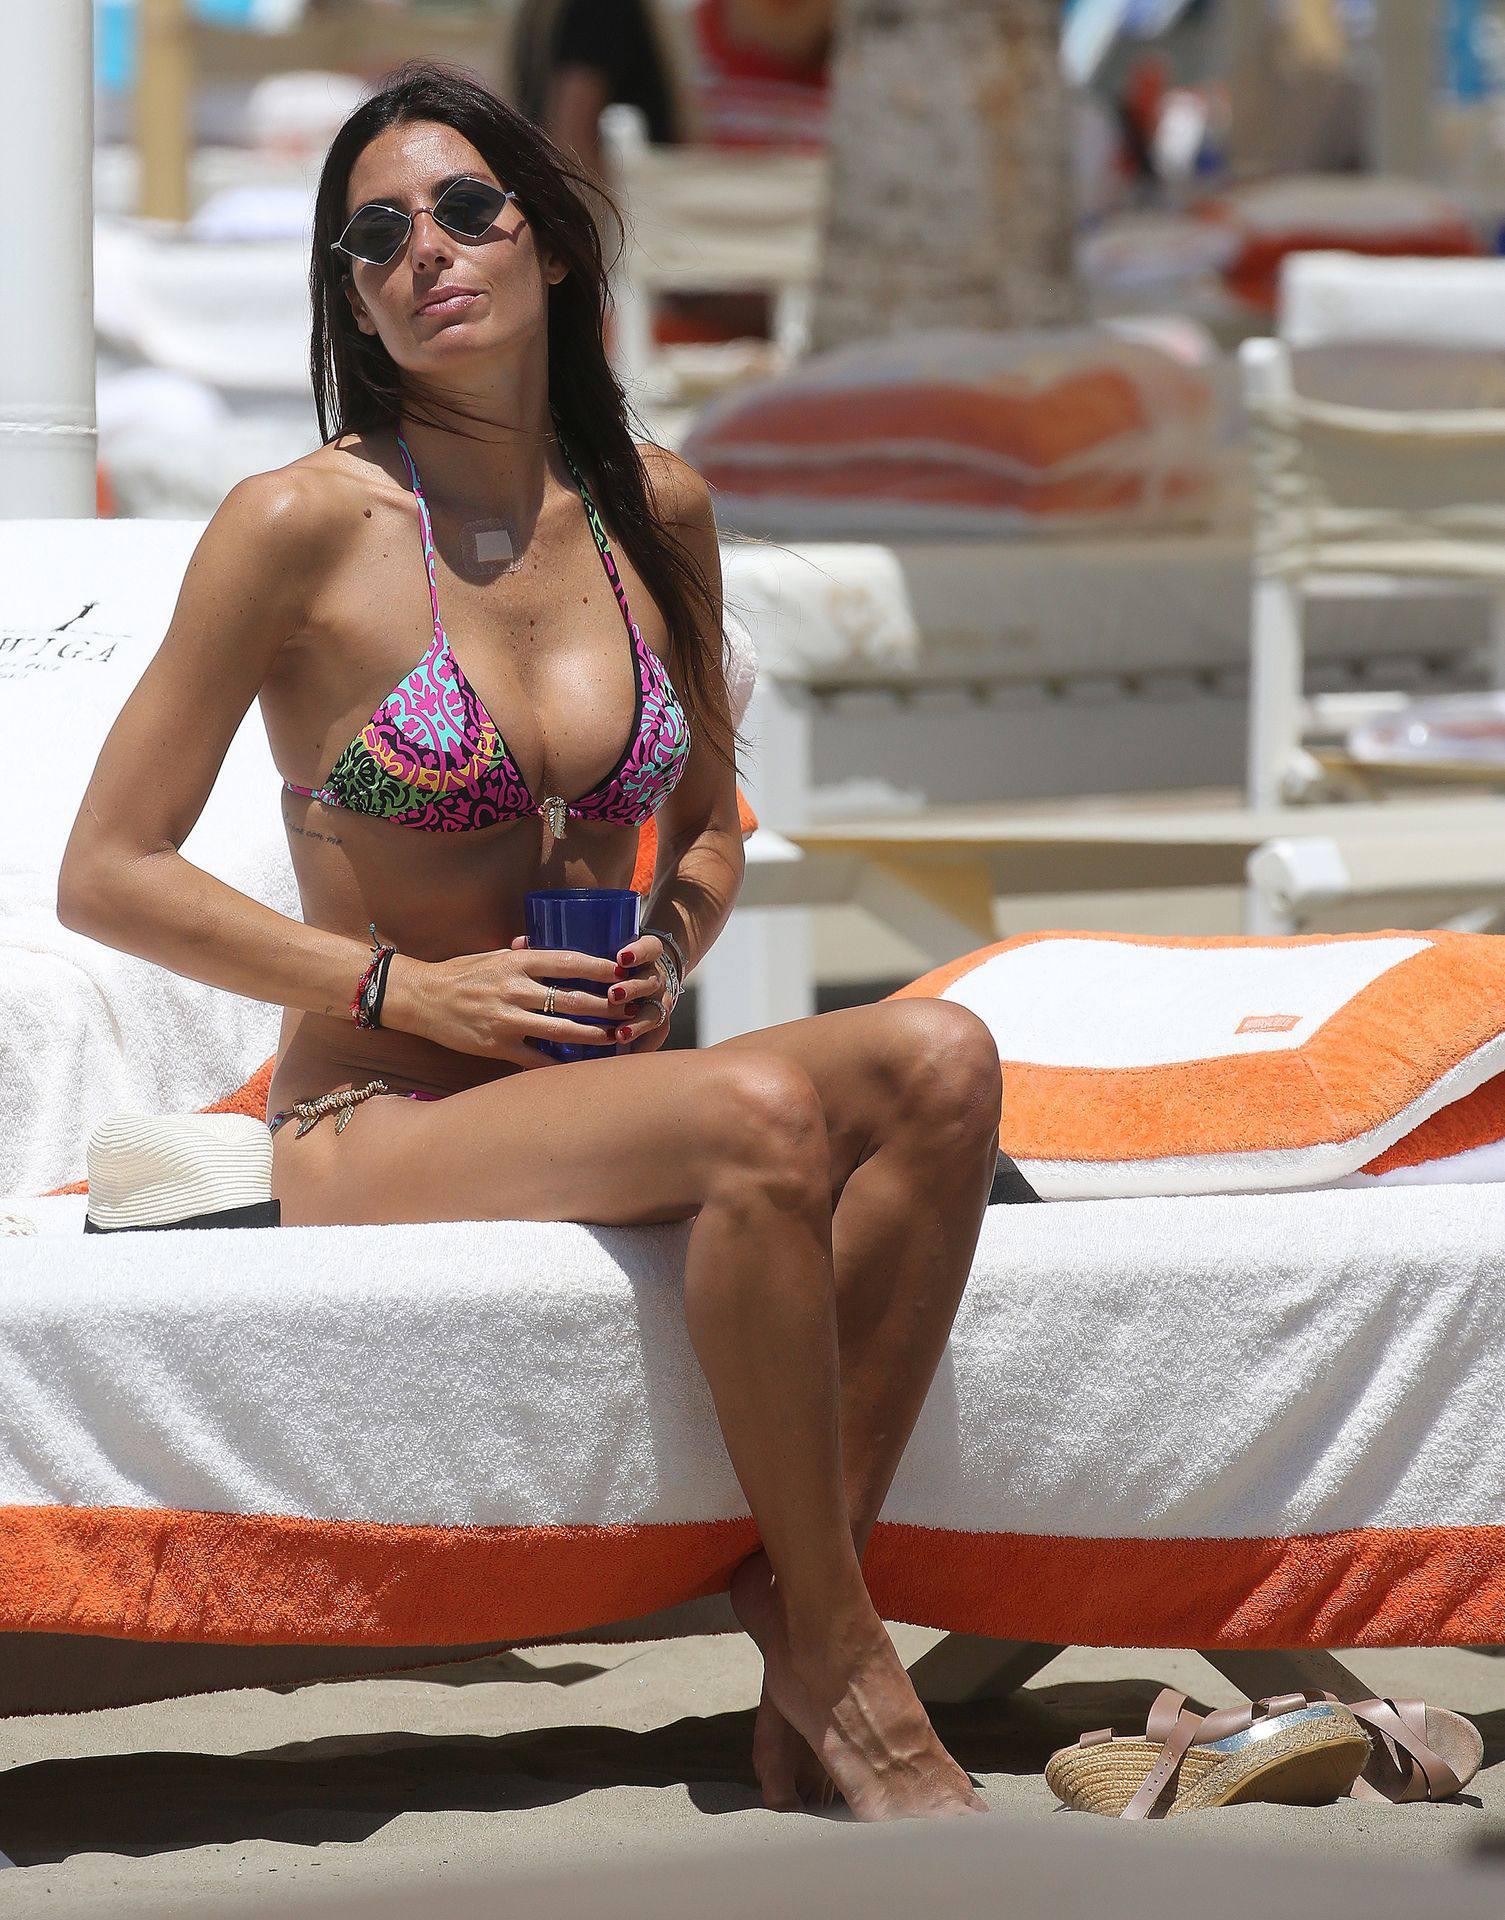 Elisabetta Gregoraci – Sexy Boobs And Ass In A Bikini At The Beach In Miami Beach 0010